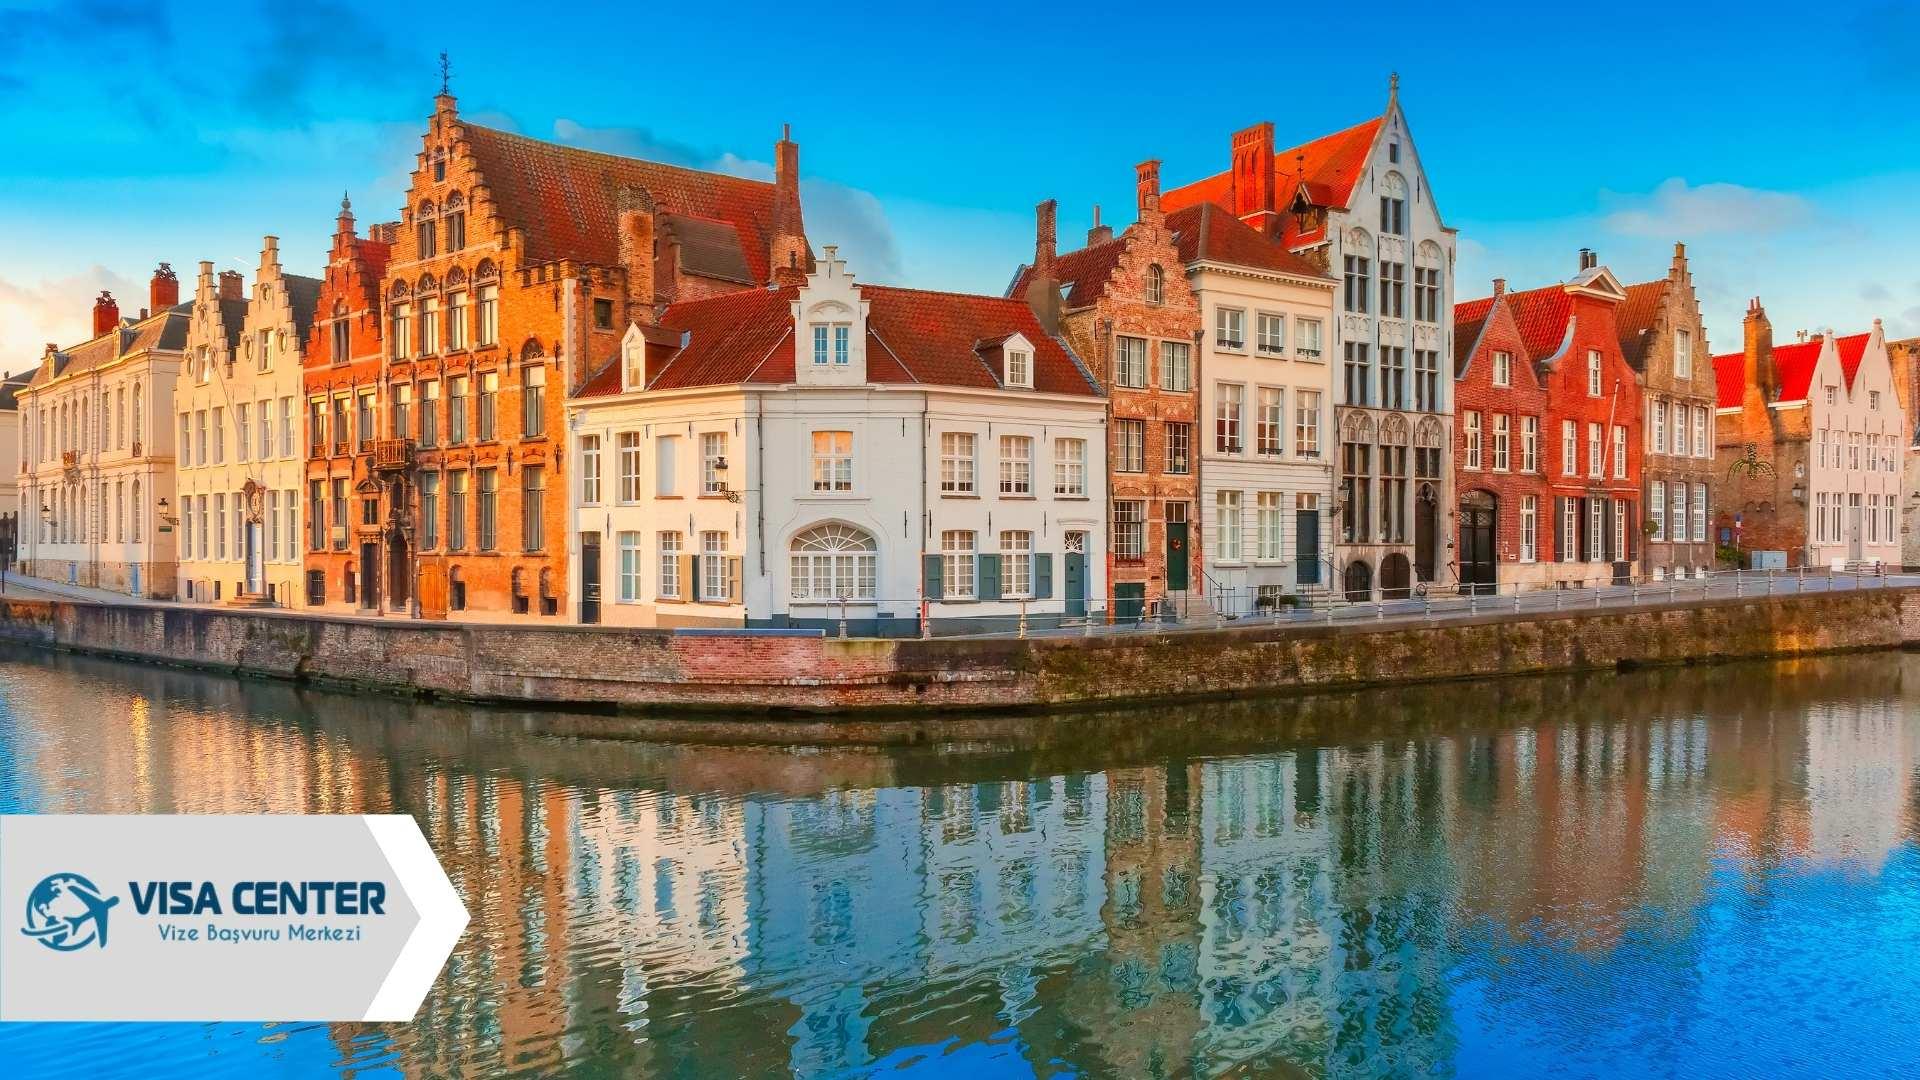 Belçika'ya Davetiye İle Gitmek